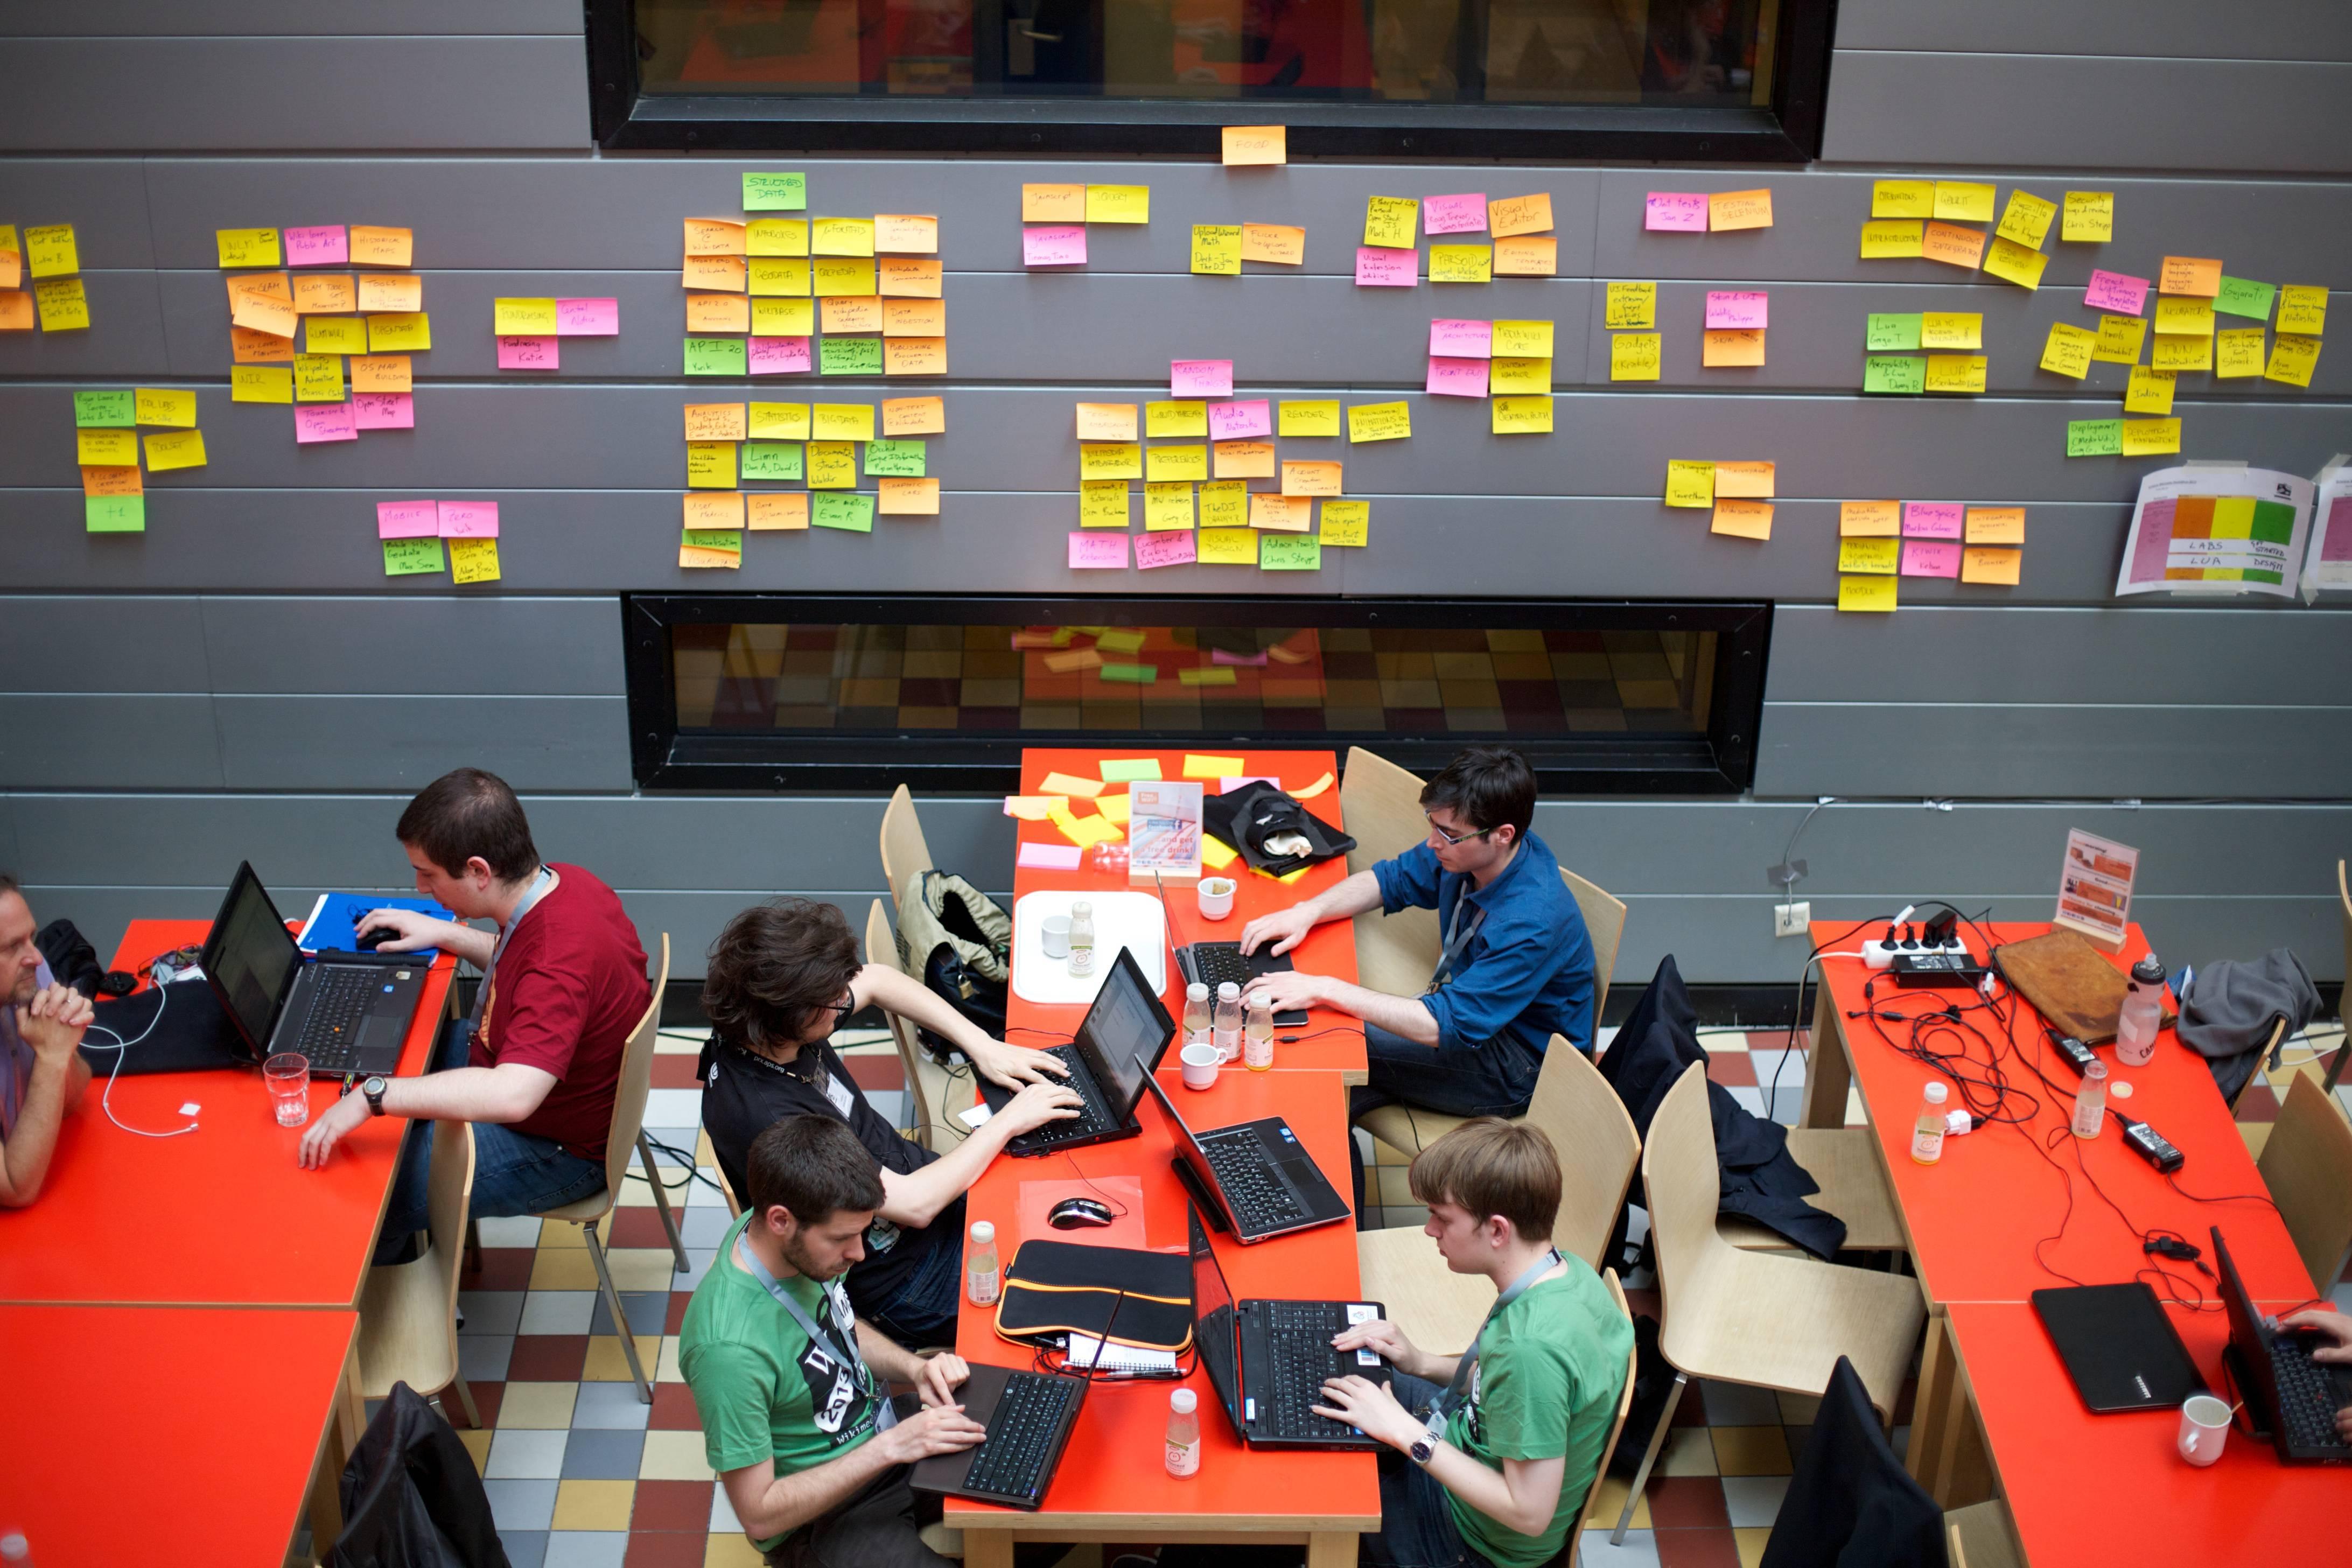 startup 與 hackathon